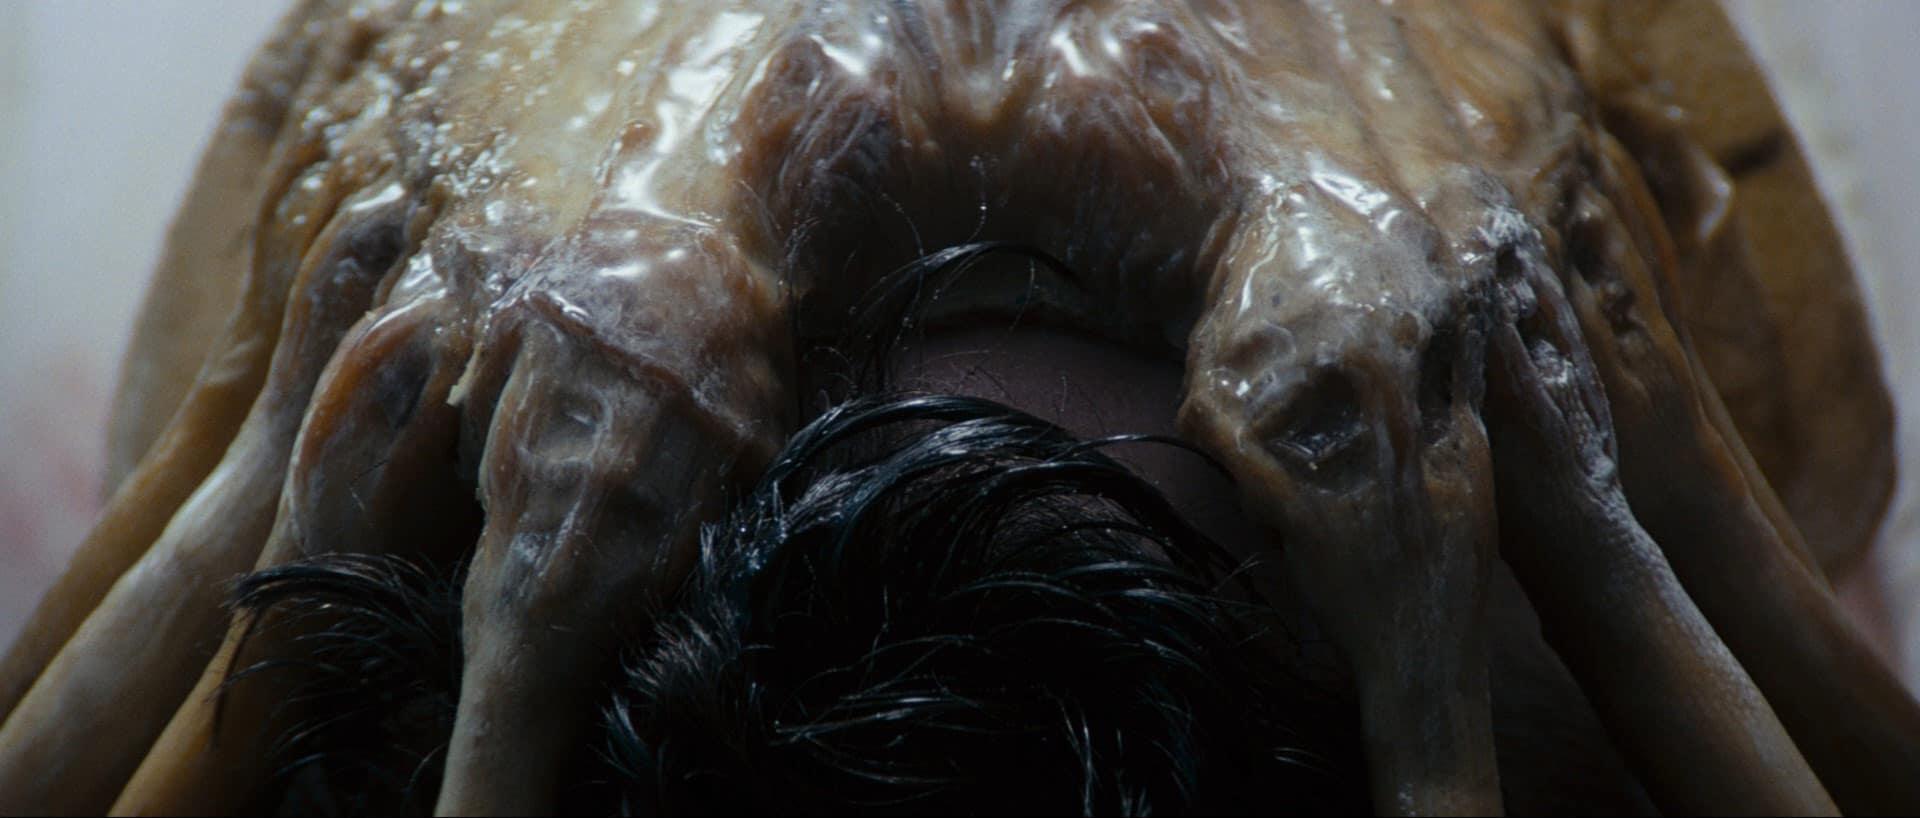 Gwen Callahan's Top 25 Horror Movies